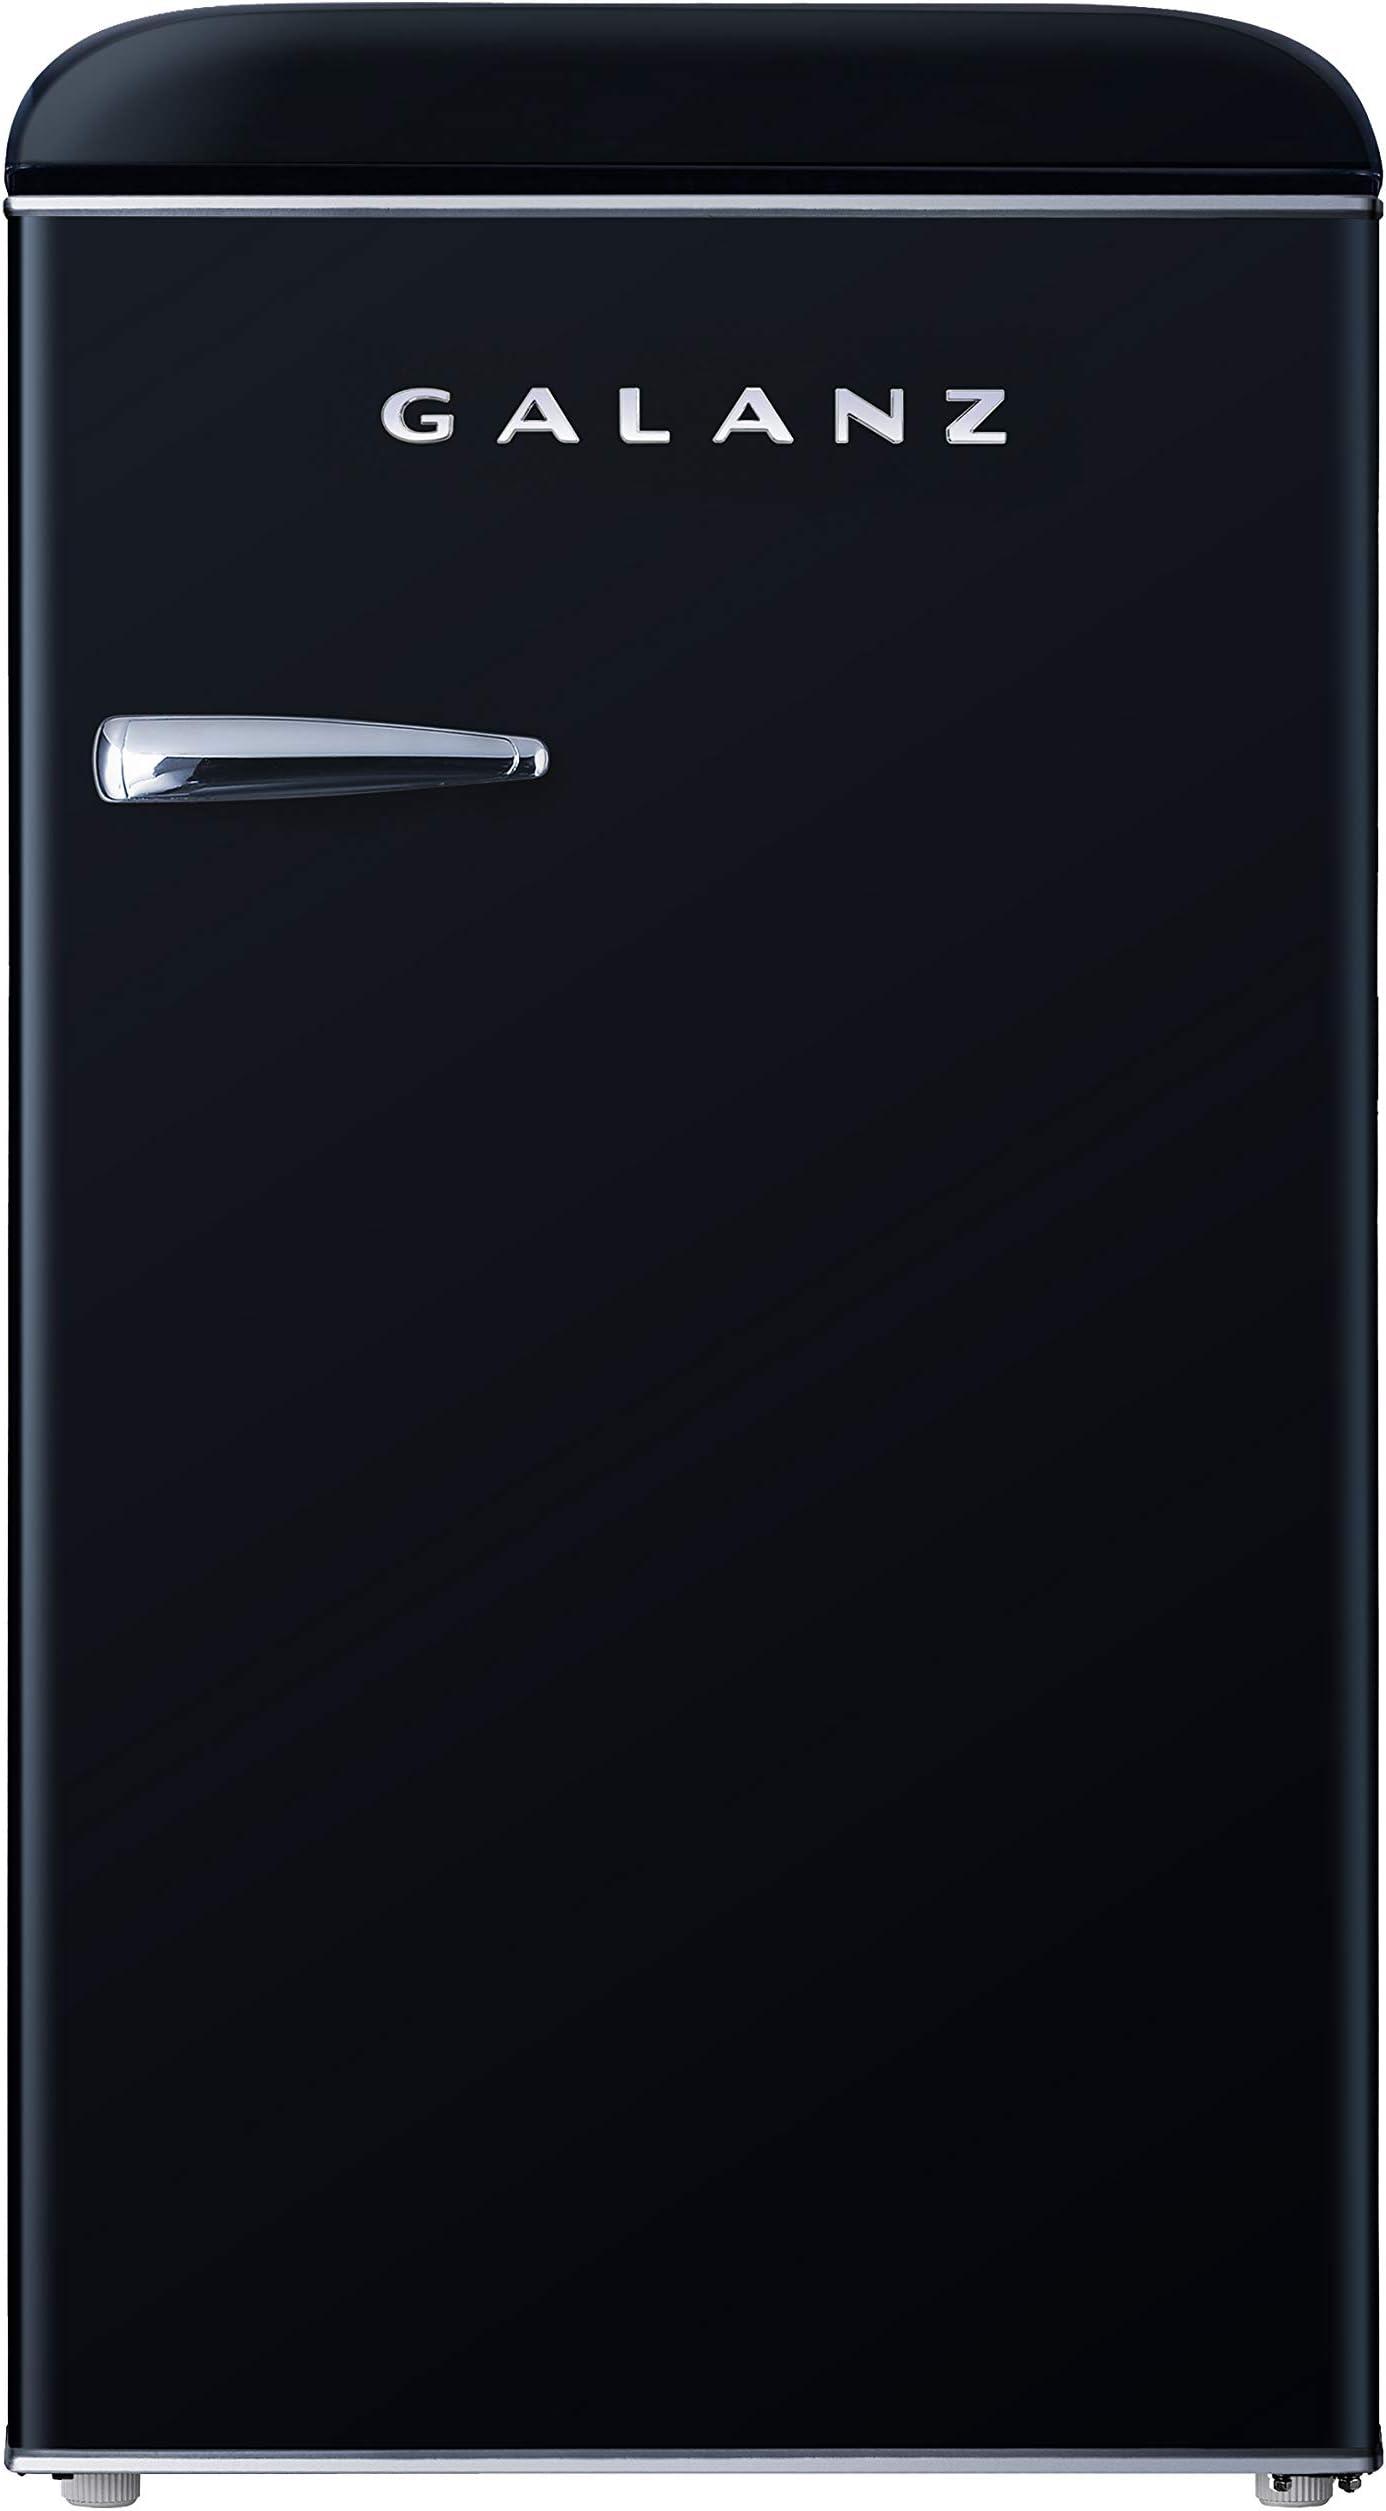 Galanz GLR35BKER Retro Compact Refrigerator, 3.5 Cu.Ft Single Door Fridge Adjustable Mechanical Thermostat with Chiller, Black, Cu Ft